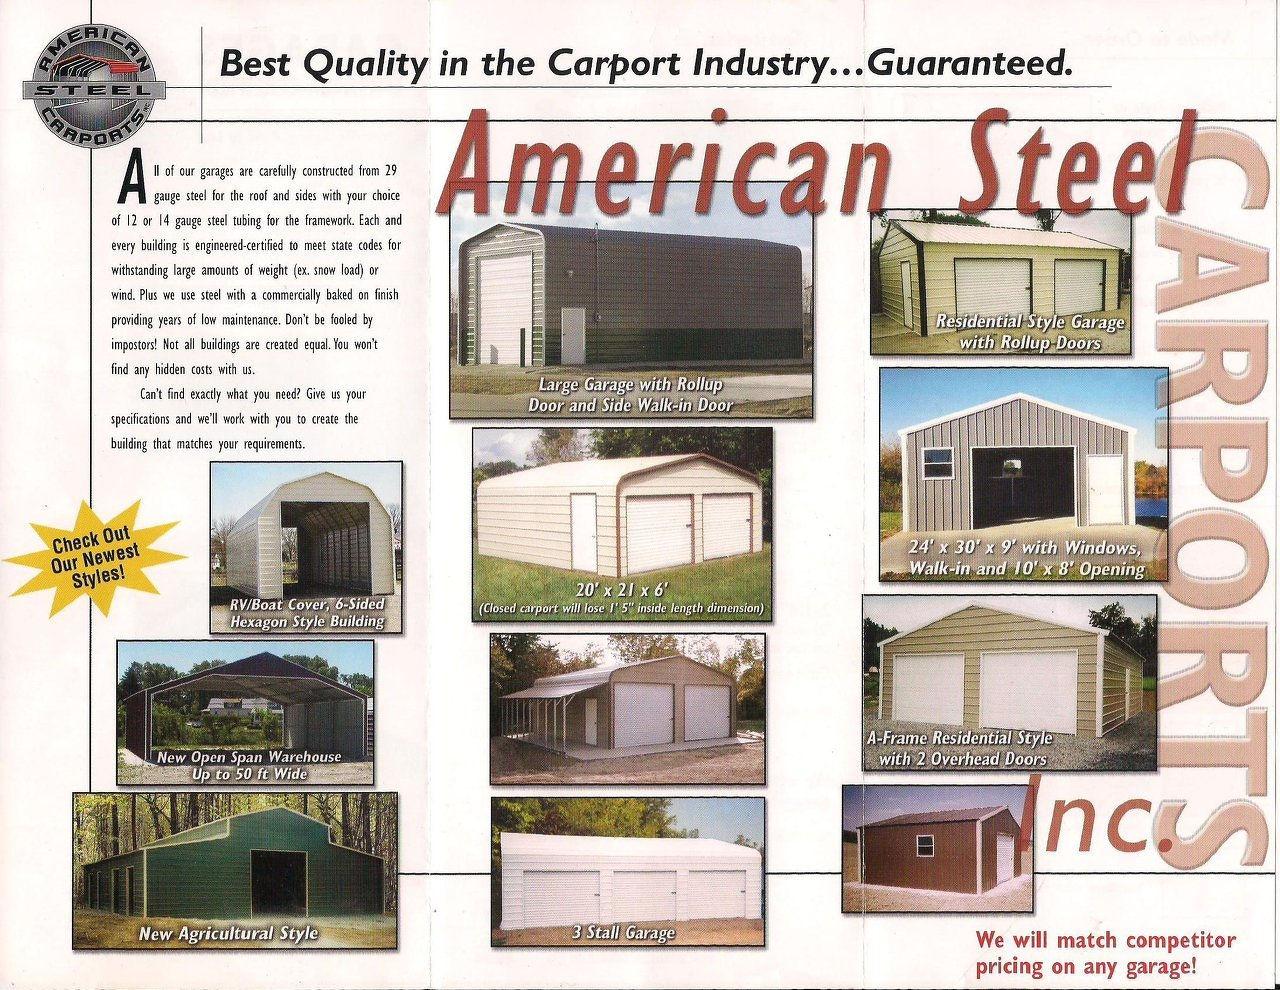 van alphen auto body auto body repair hillsdale ny carports we are an american steel carport dealer